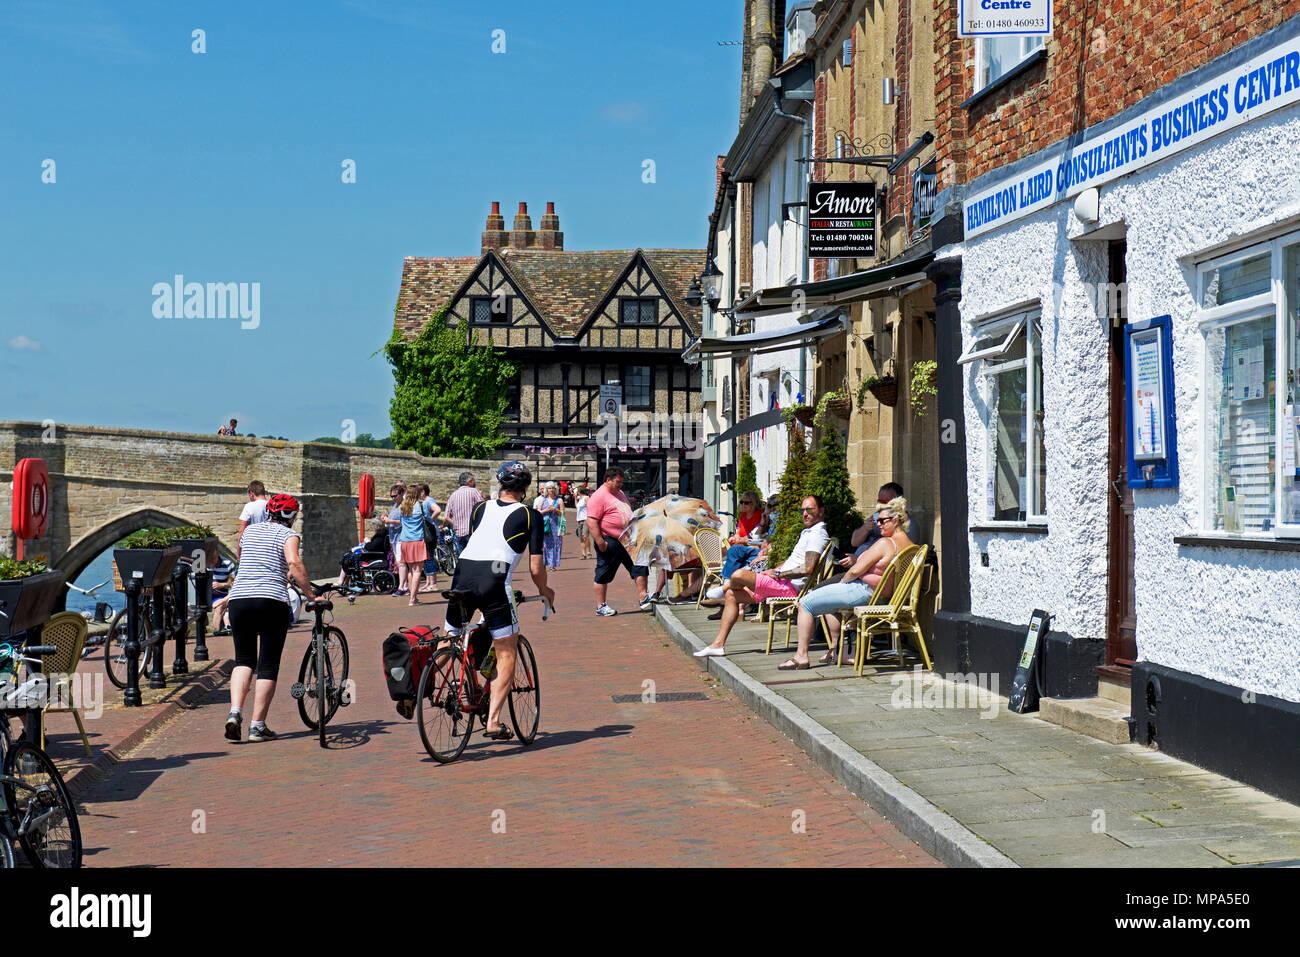 the-quay-st-ives-cambridgeshire-england-uk-MPA5E0.jpg